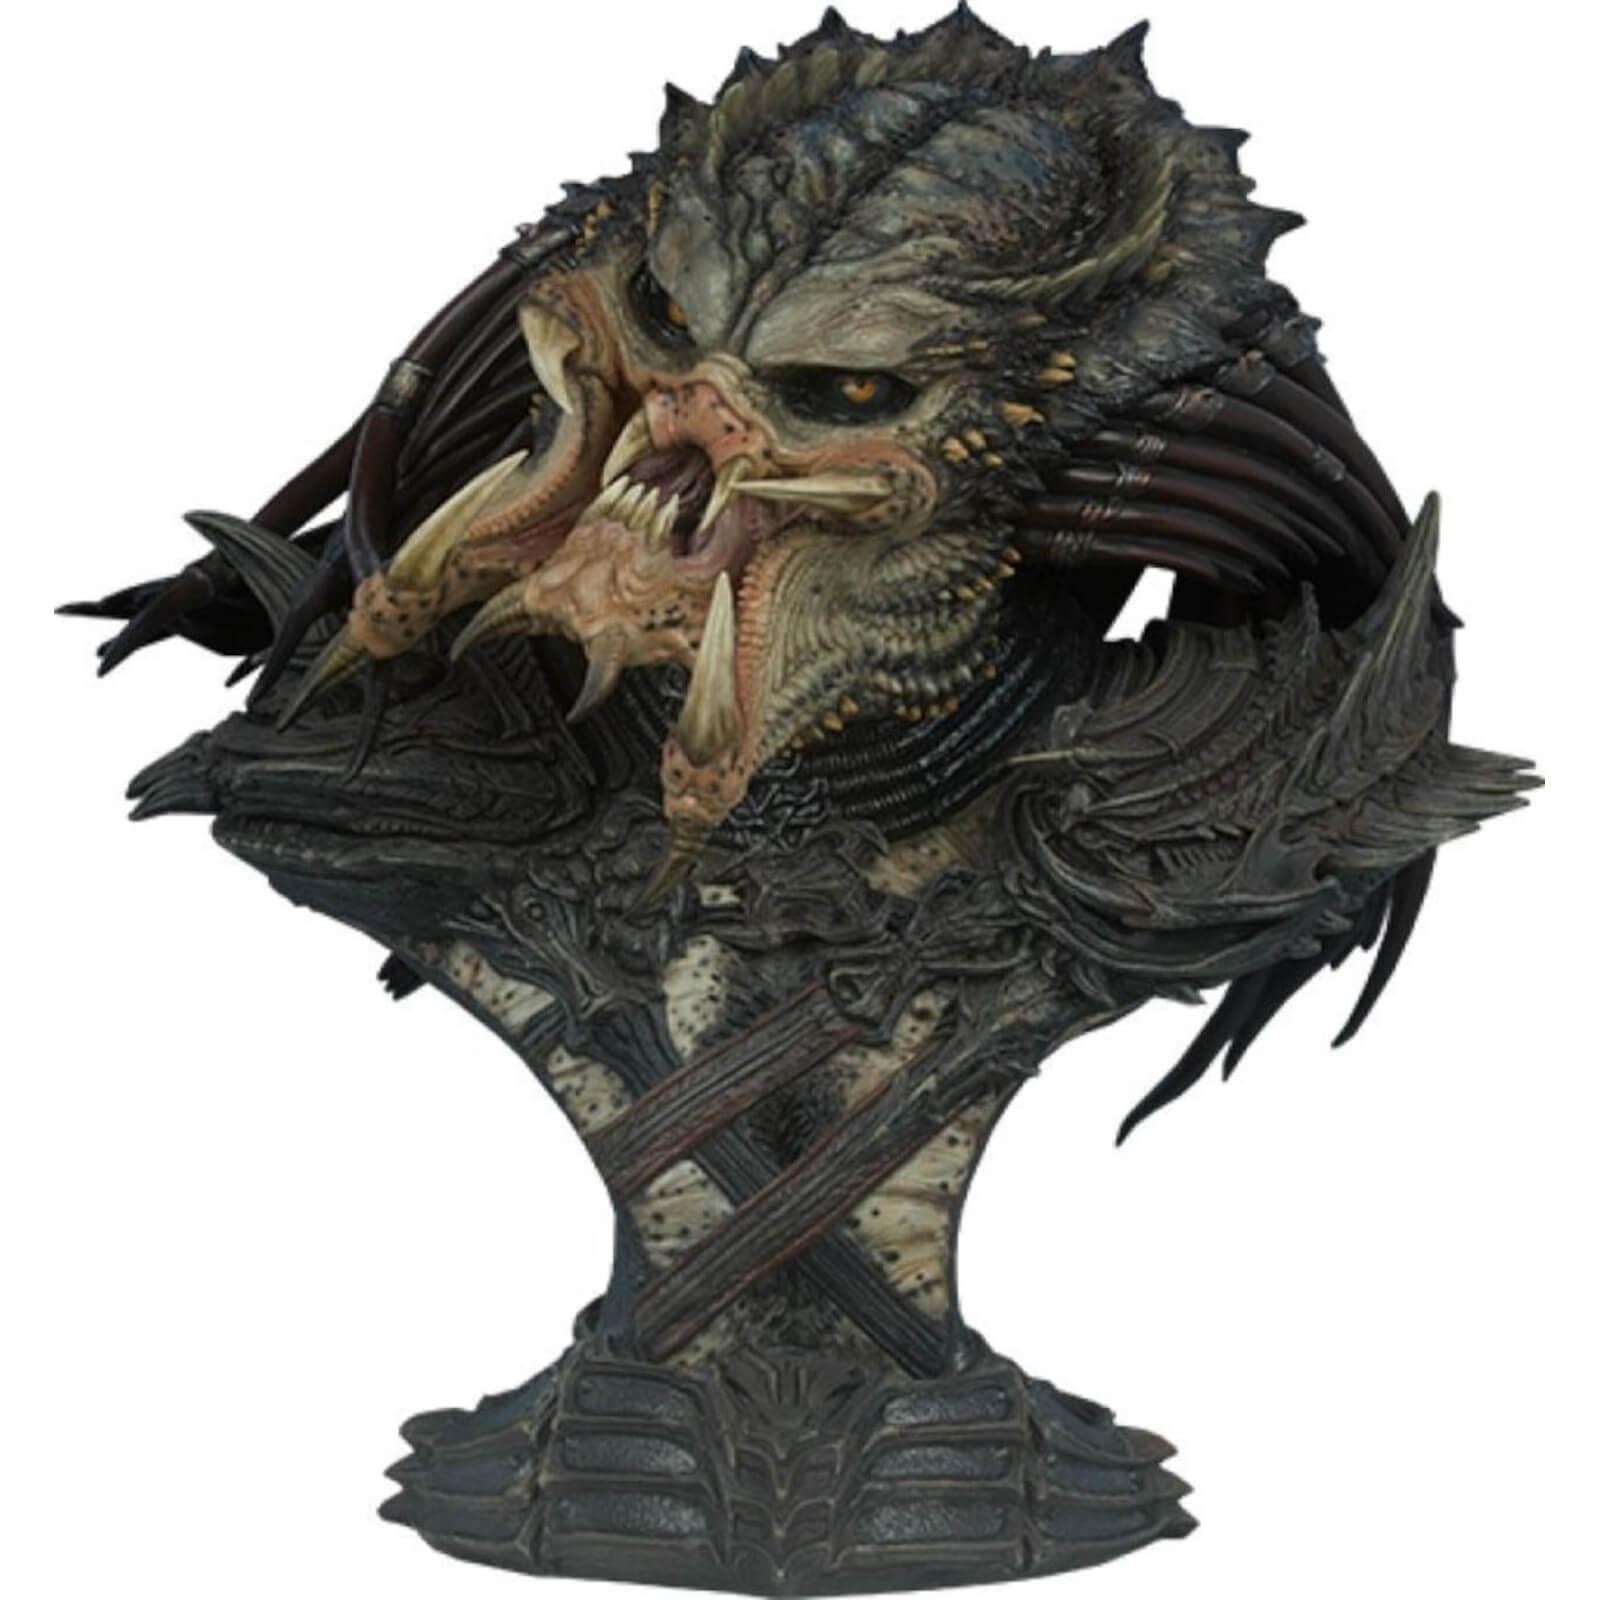 Sideshow Collectibles Predator Mythos Legendary Scale Bust Predator Barbarian 48 cm